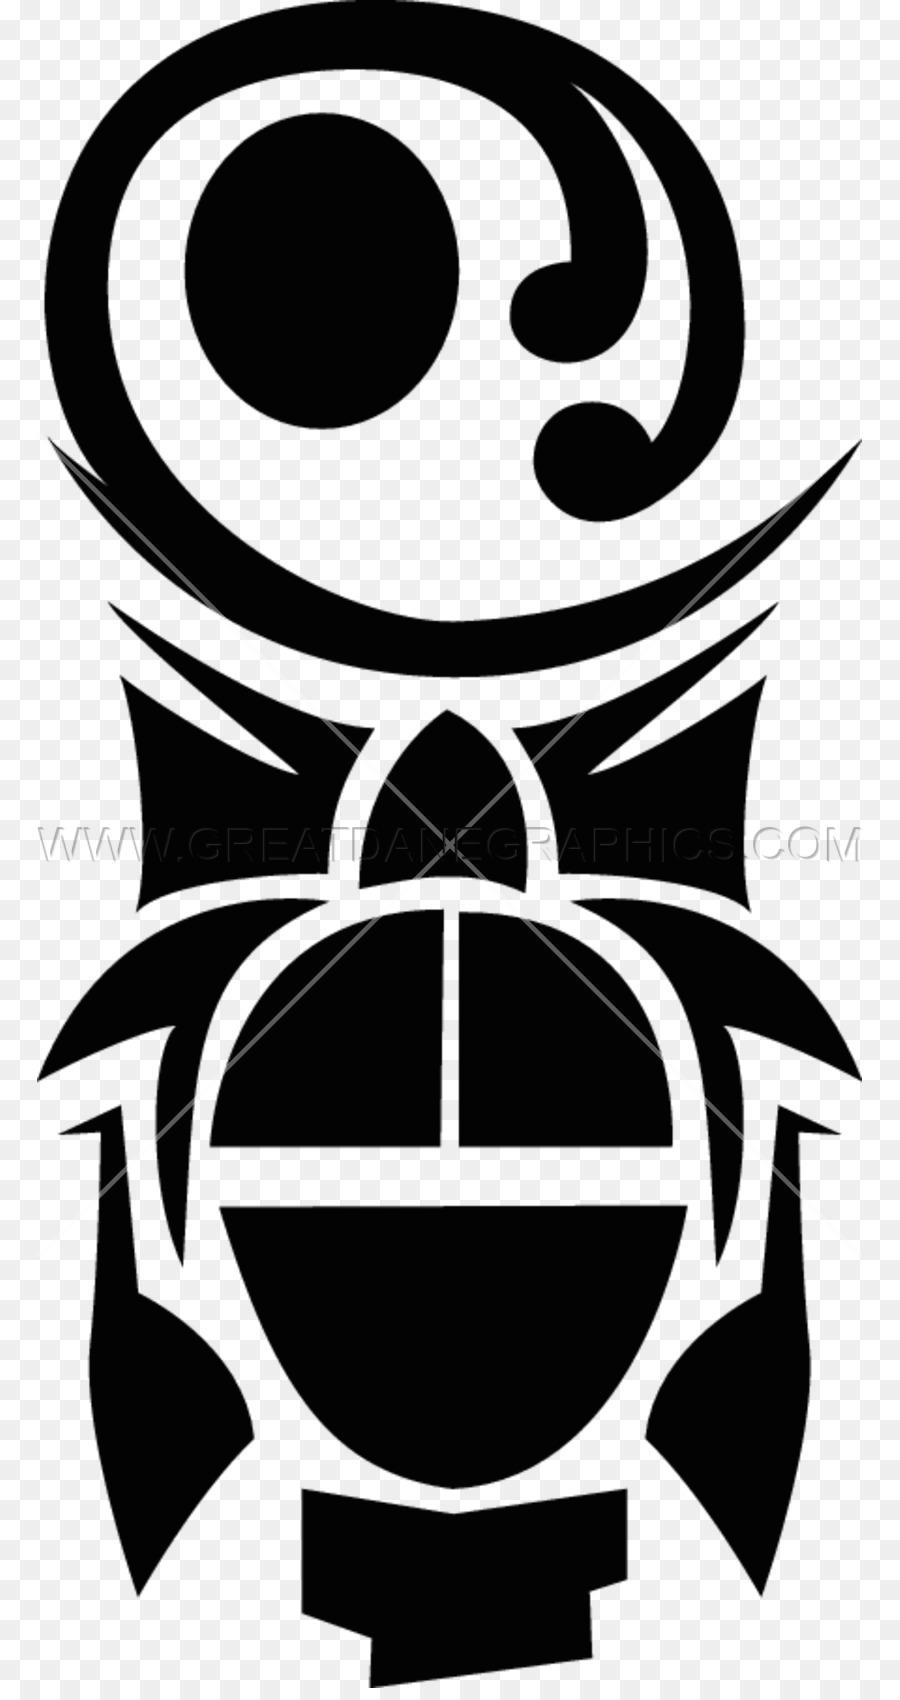 Printed T Shirt Screen Printing Work Of Art Vinyl Cutter Turtles